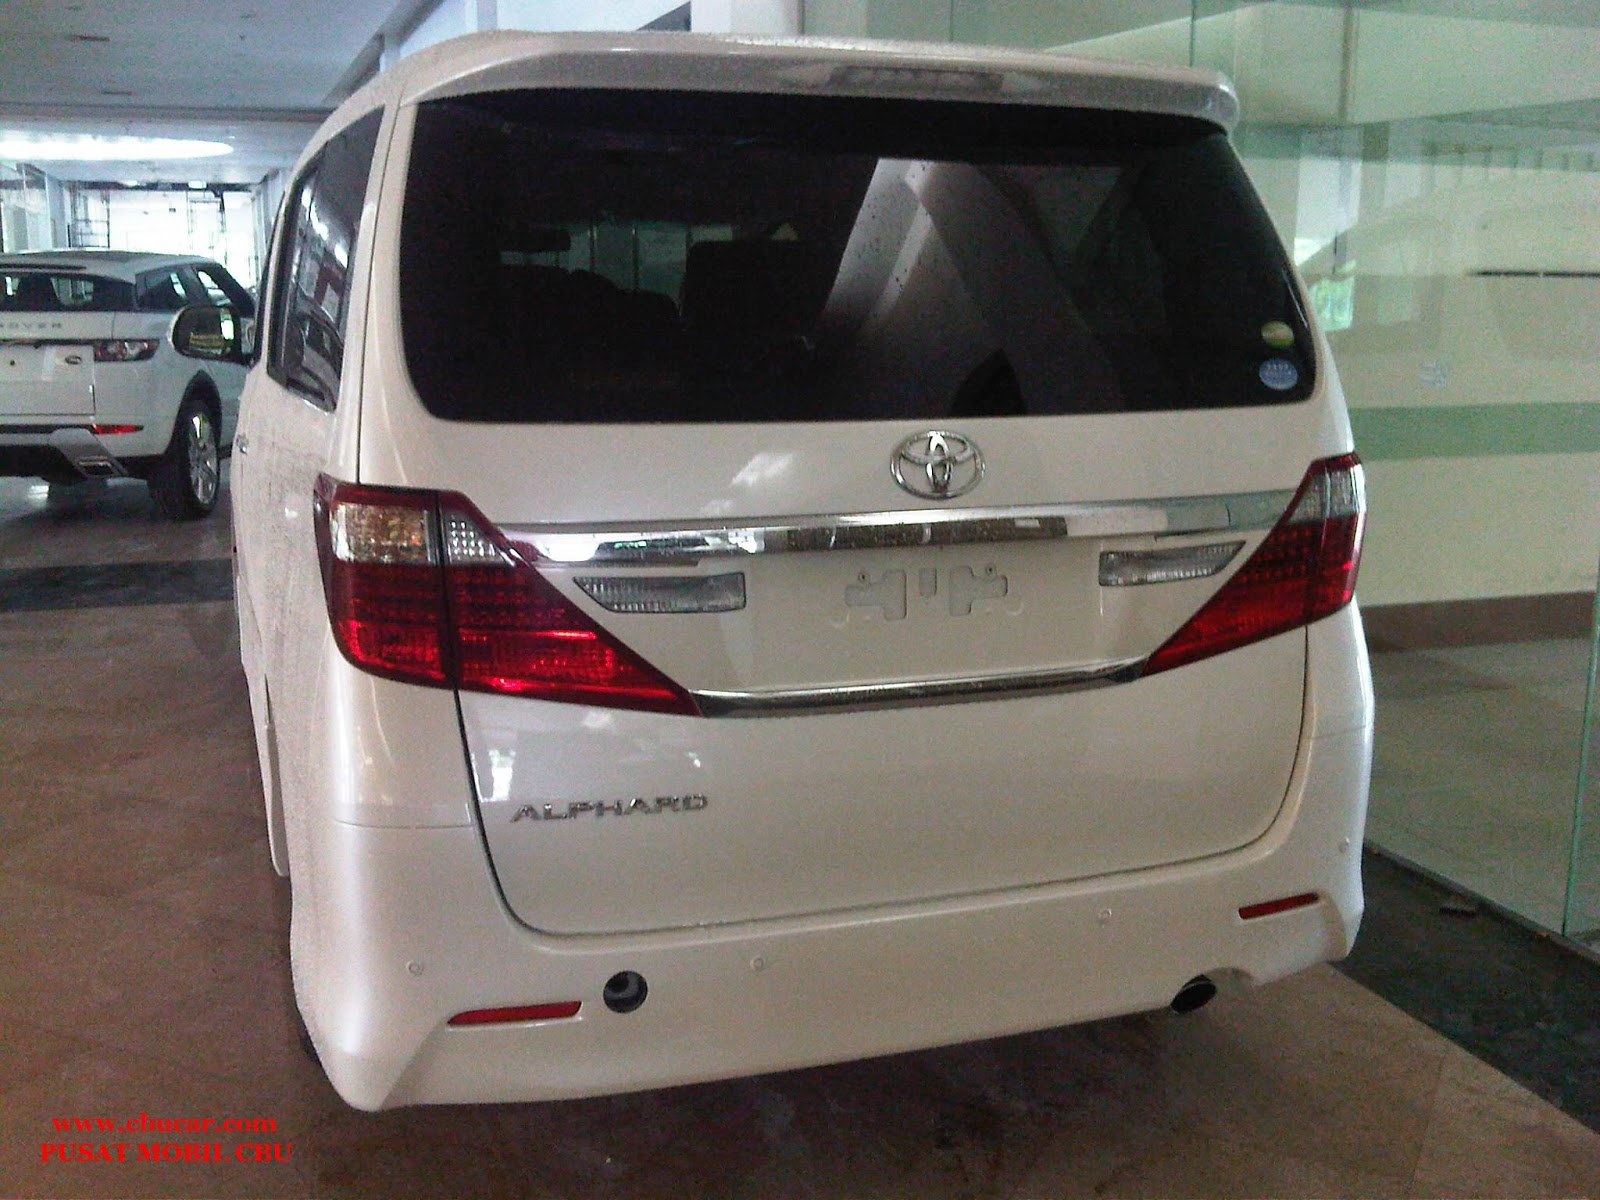 All New Alphard Facelift Kunci Grand Avanza Toyota 2014 Mobil Baru Cbu